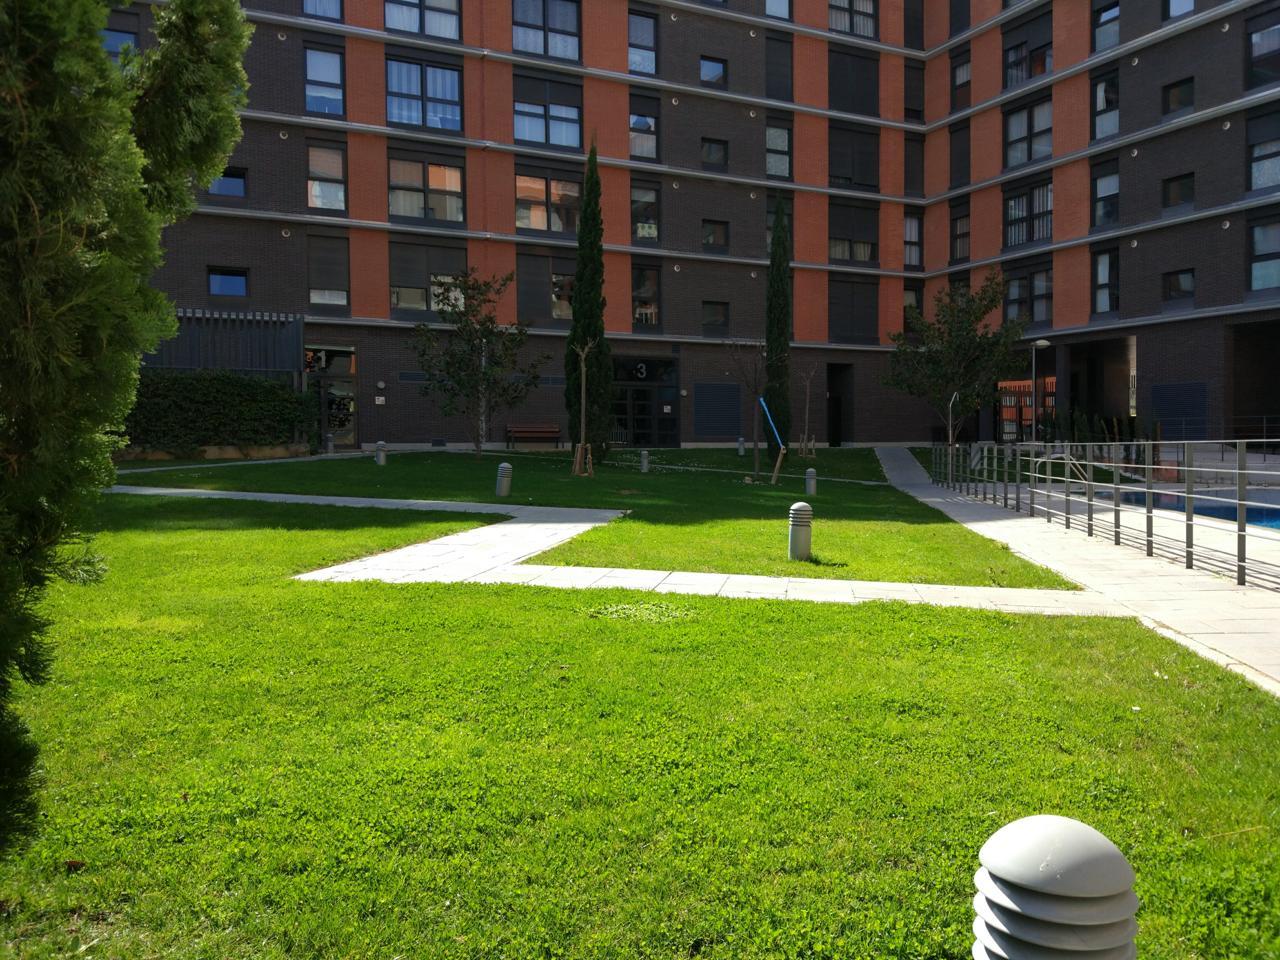 piso inversores con inquilino obra nueva zaragoza|publipisos inmobiliarias-6